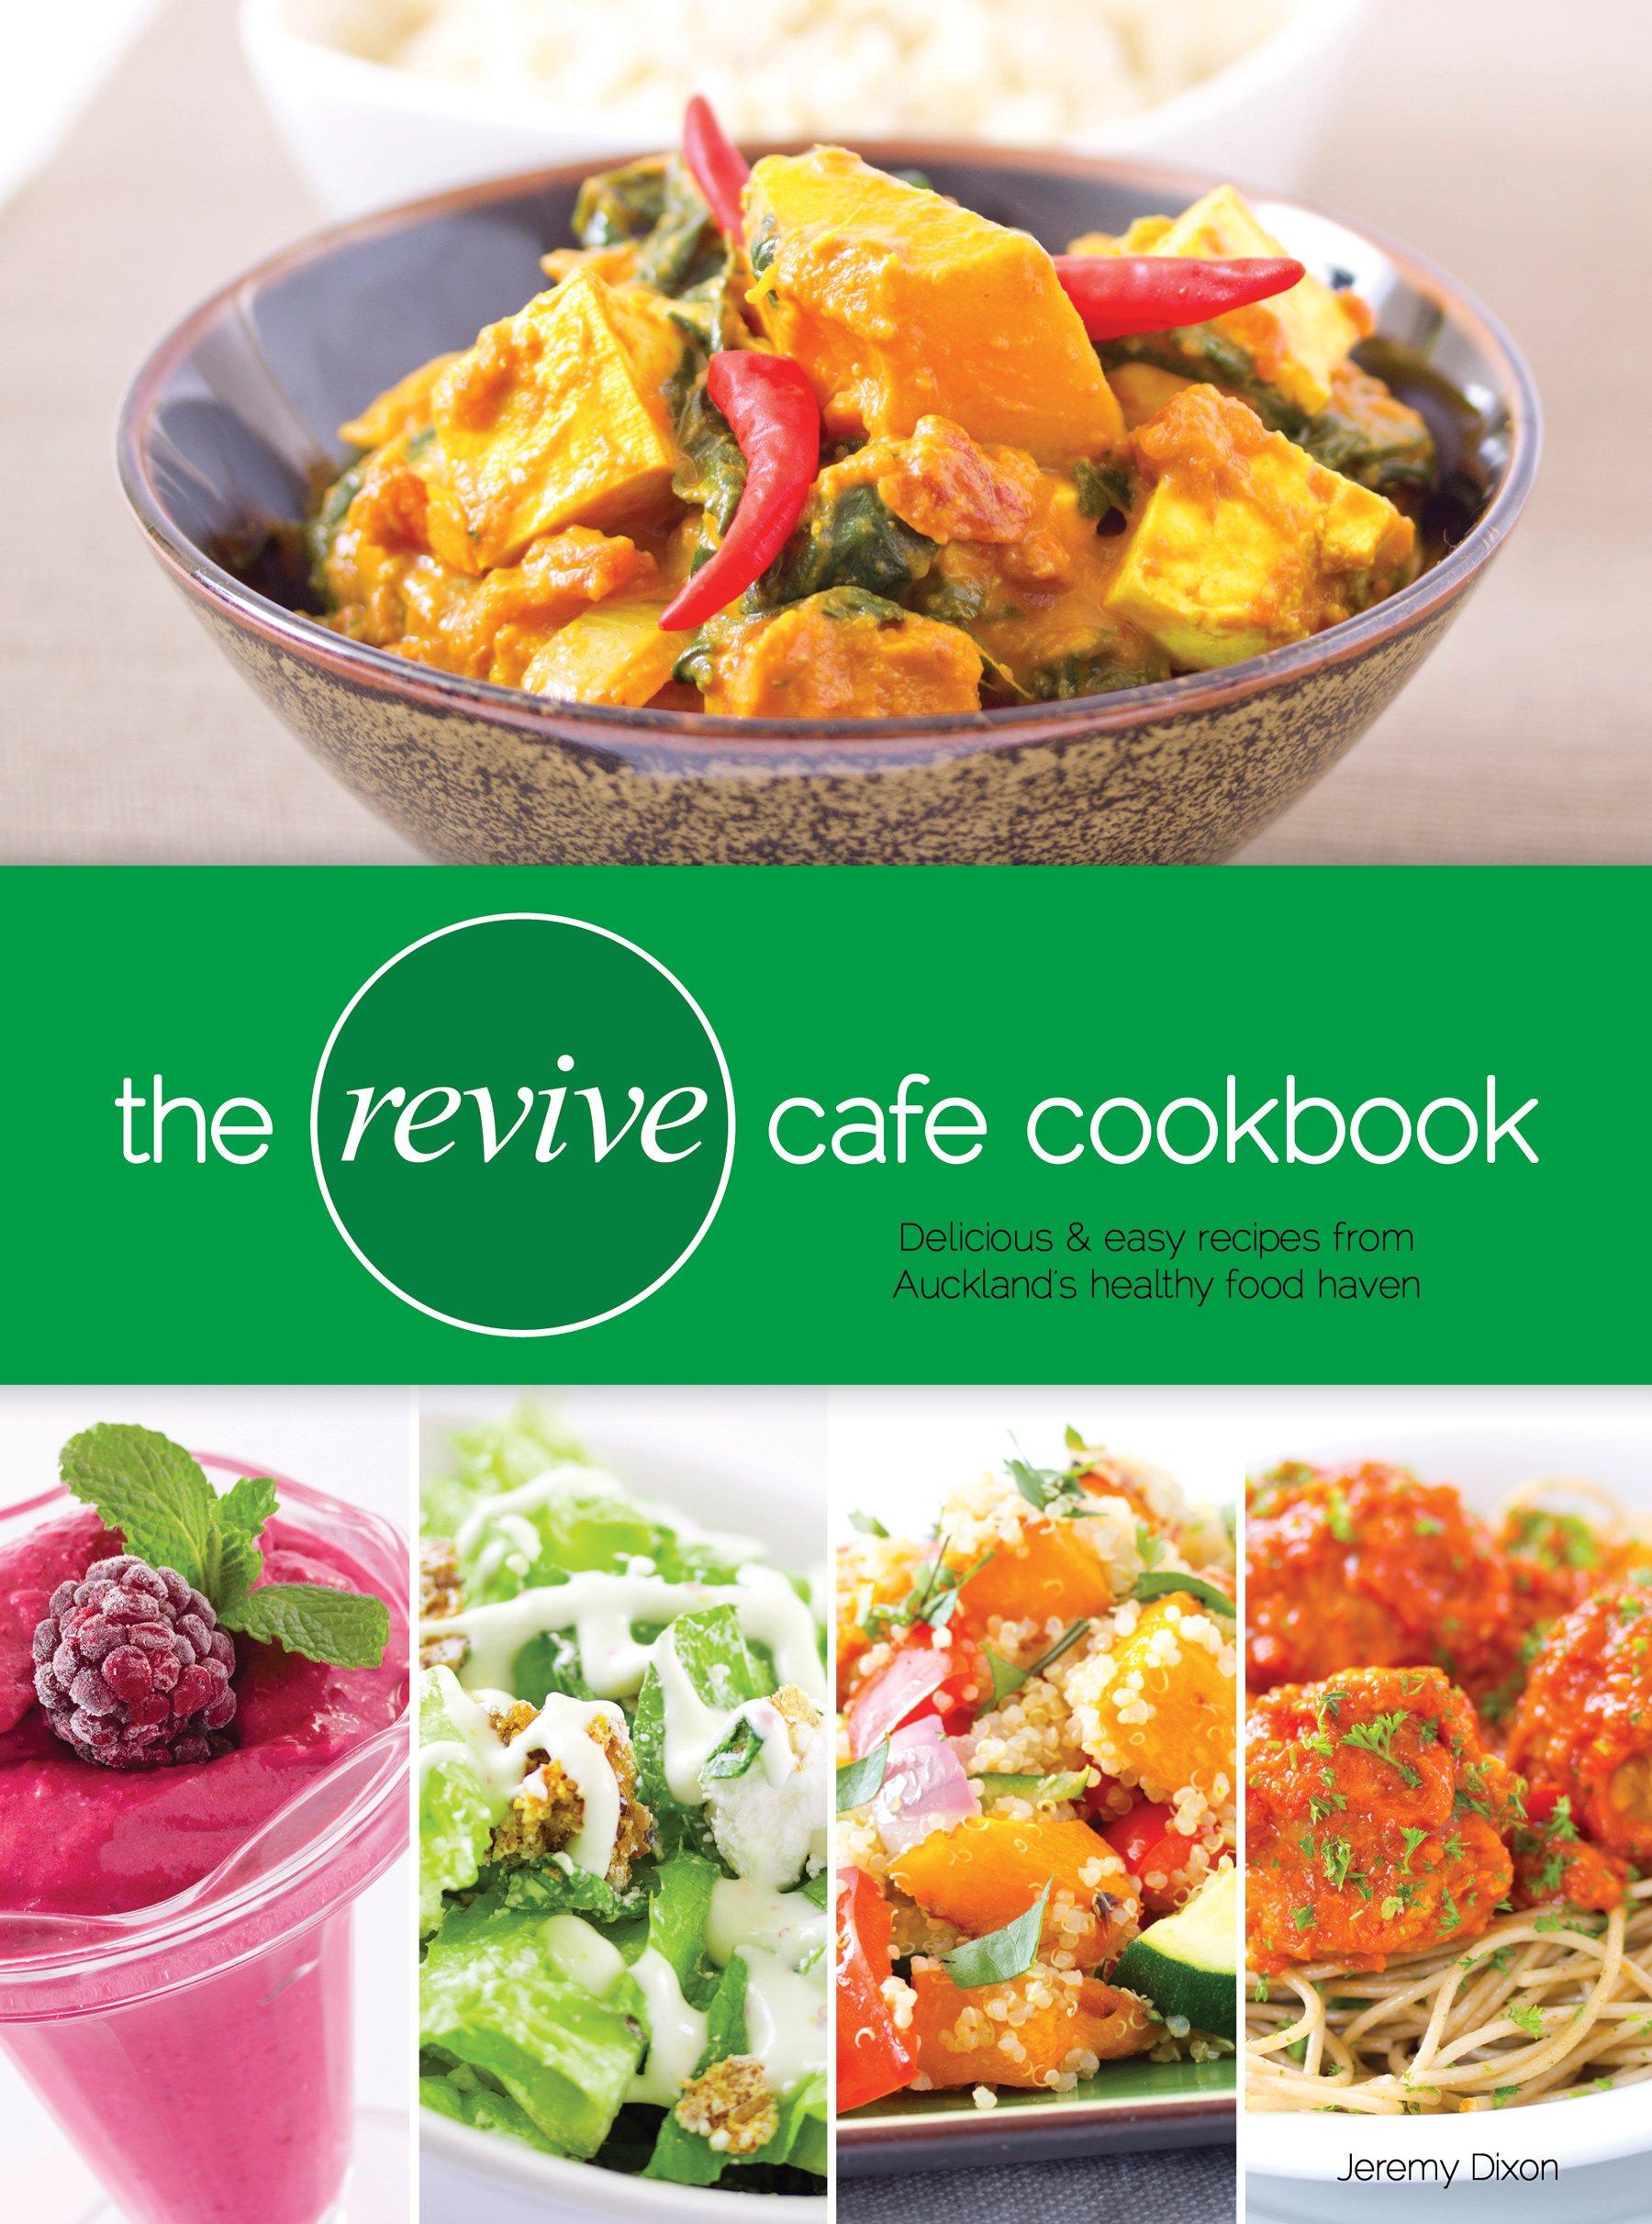 The revive cafe cookbook jeremy dixon 9780473190576 amazon books forumfinder Images